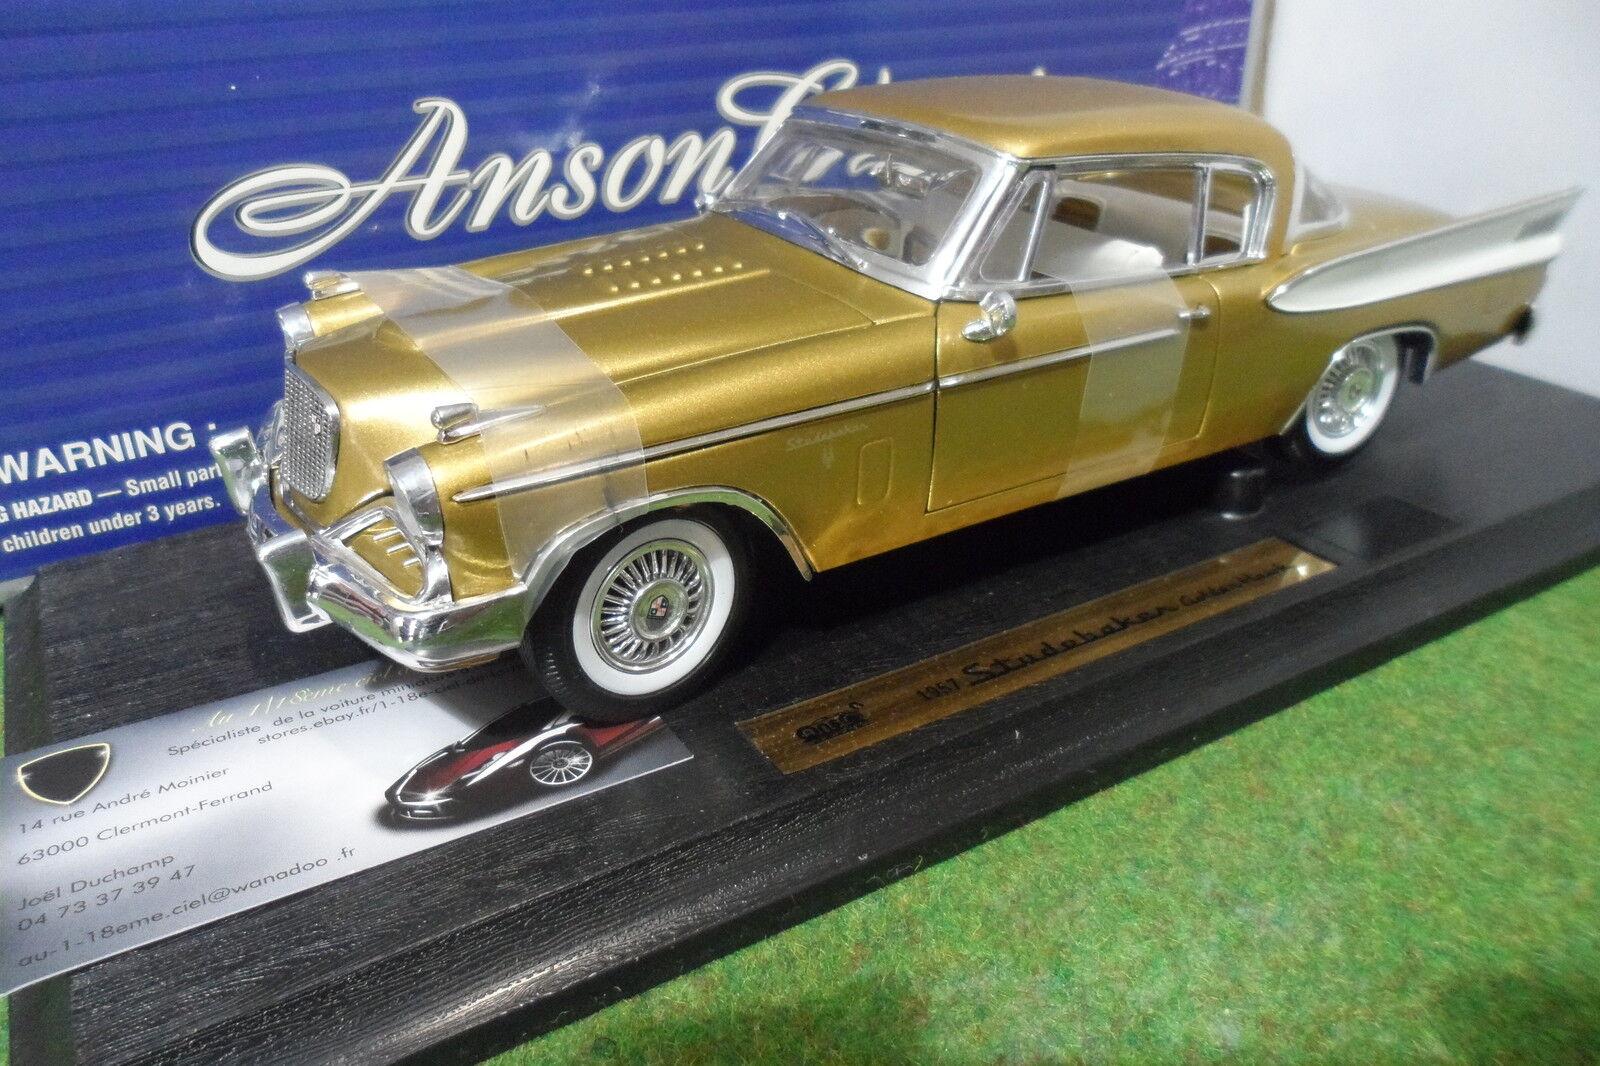 STUDEBAKER oroEN HAWK 1957 Or oro au 1 18 ANSON 30384 voiture miniature